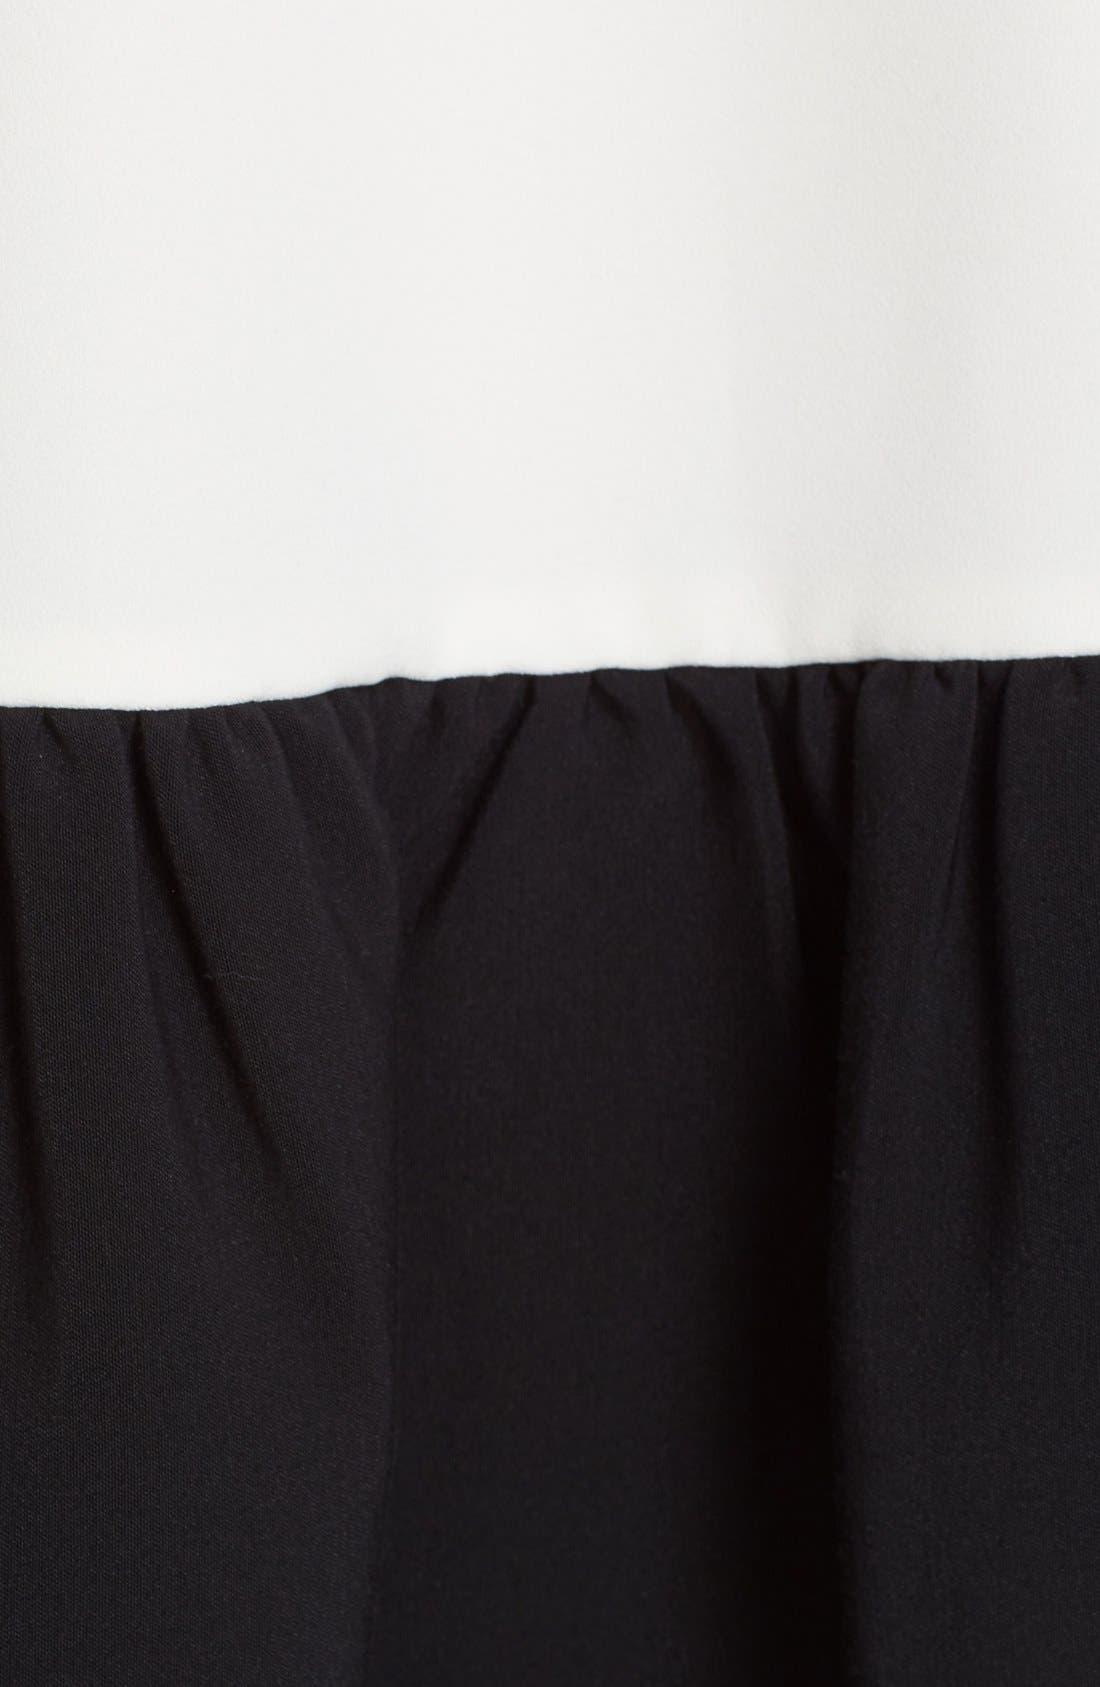 Fuji Colorblock Ruffle Hem Trapeze Dress,                             Alternate thumbnail 5, color,                             002